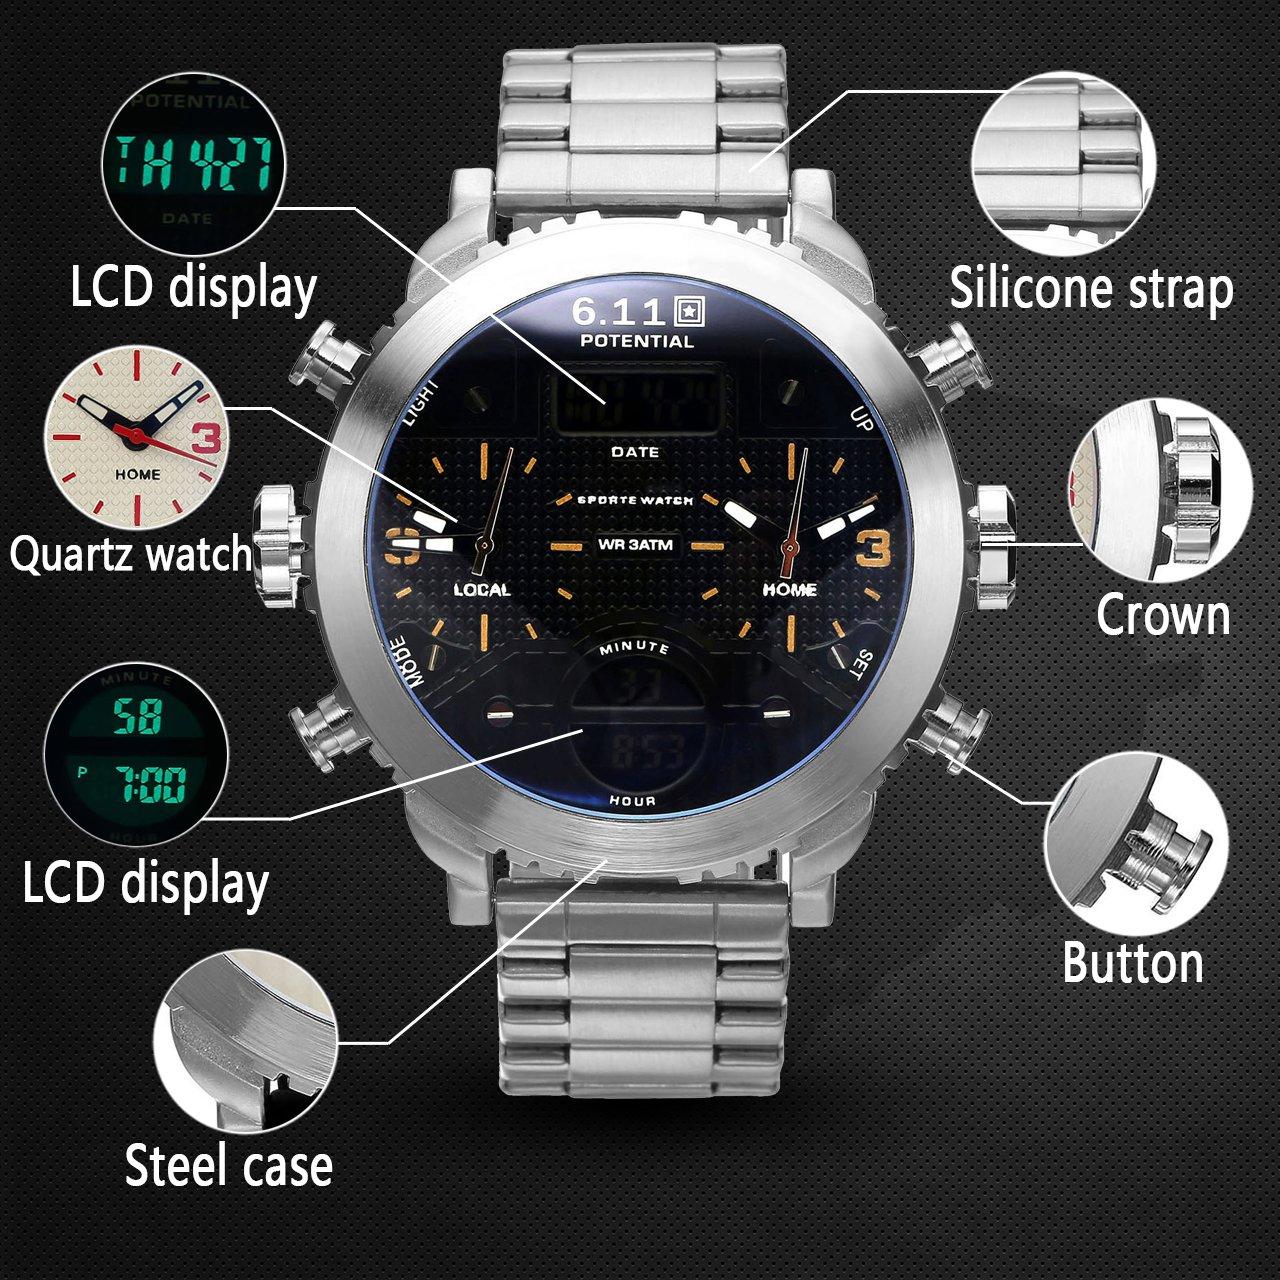 JSDDE Herren Armbanduhr Chronograph LCD Digital + Dual Quarz Uhrwerk Kalender 3-Zeitzone 3ATM Multifunktionsuhr (NO.QY25-09)